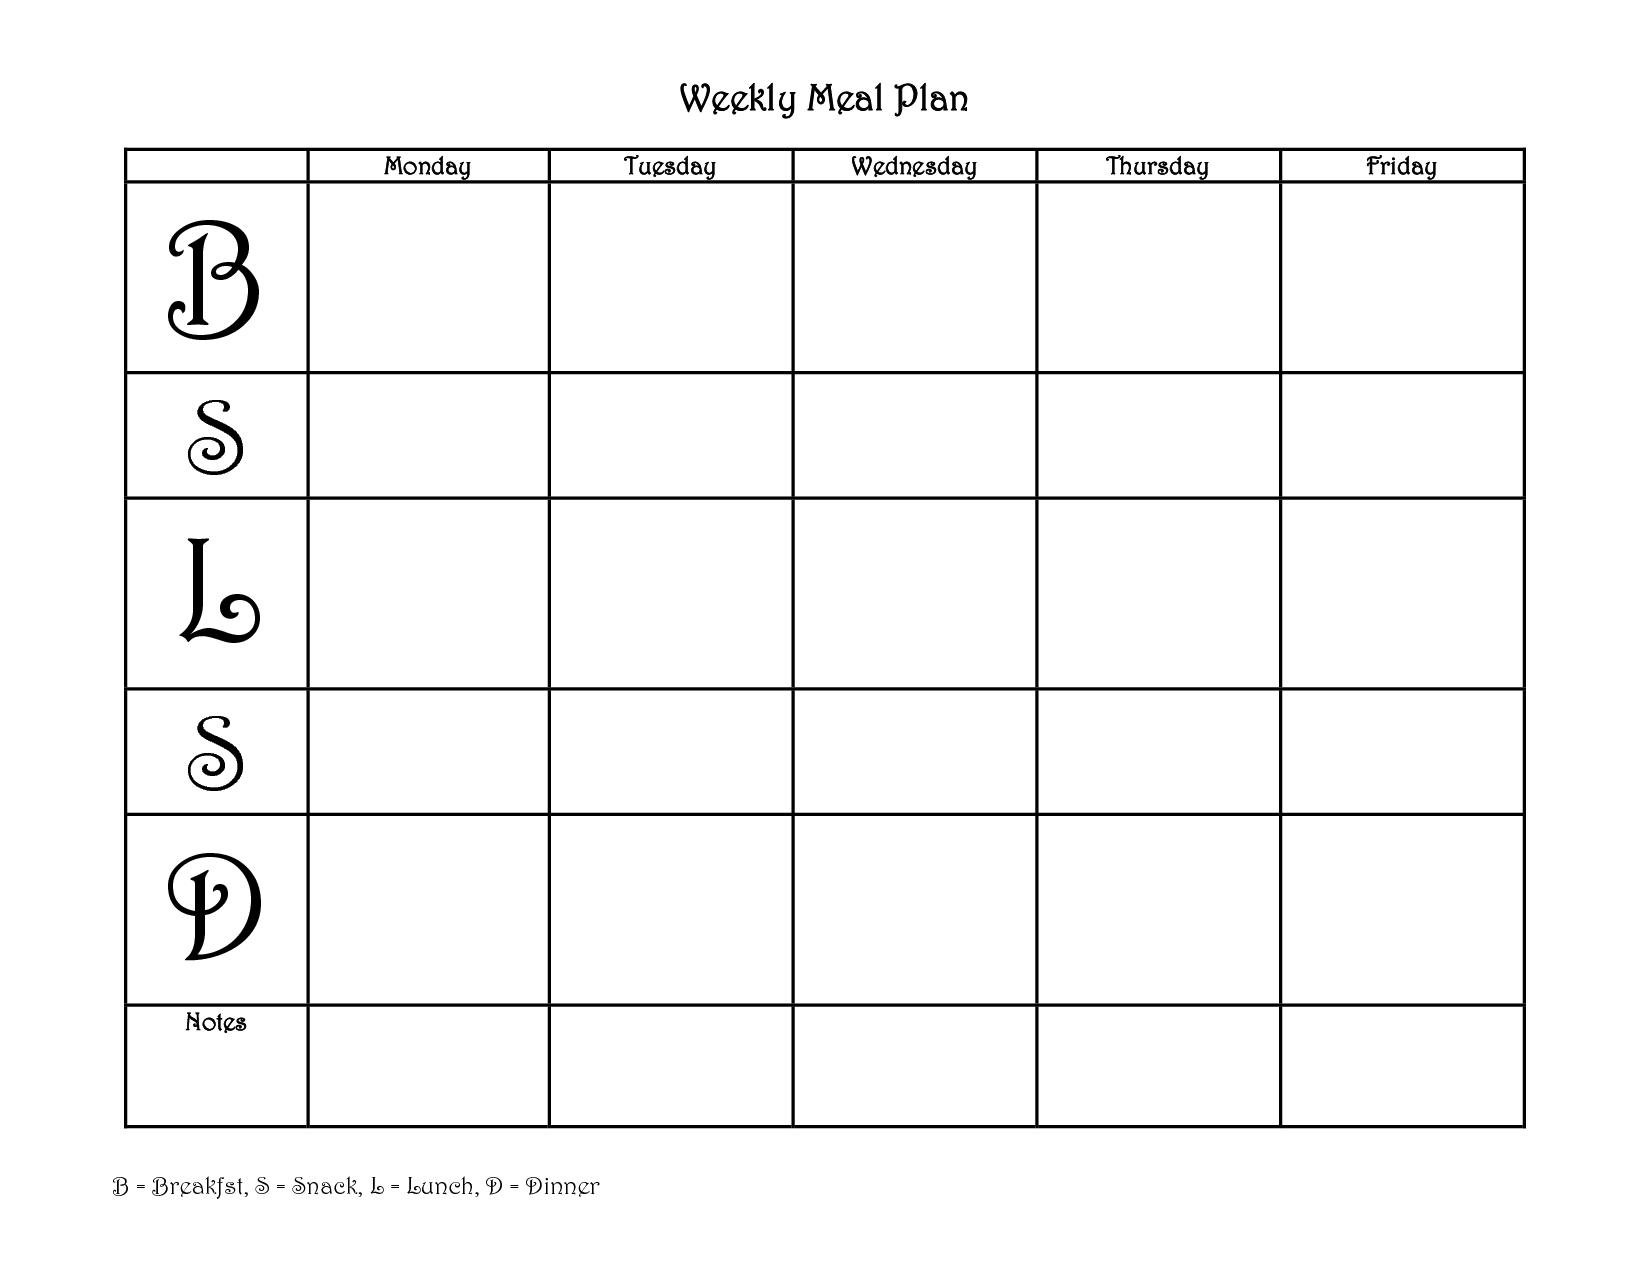 Collect Meal Plan Calendar Printable